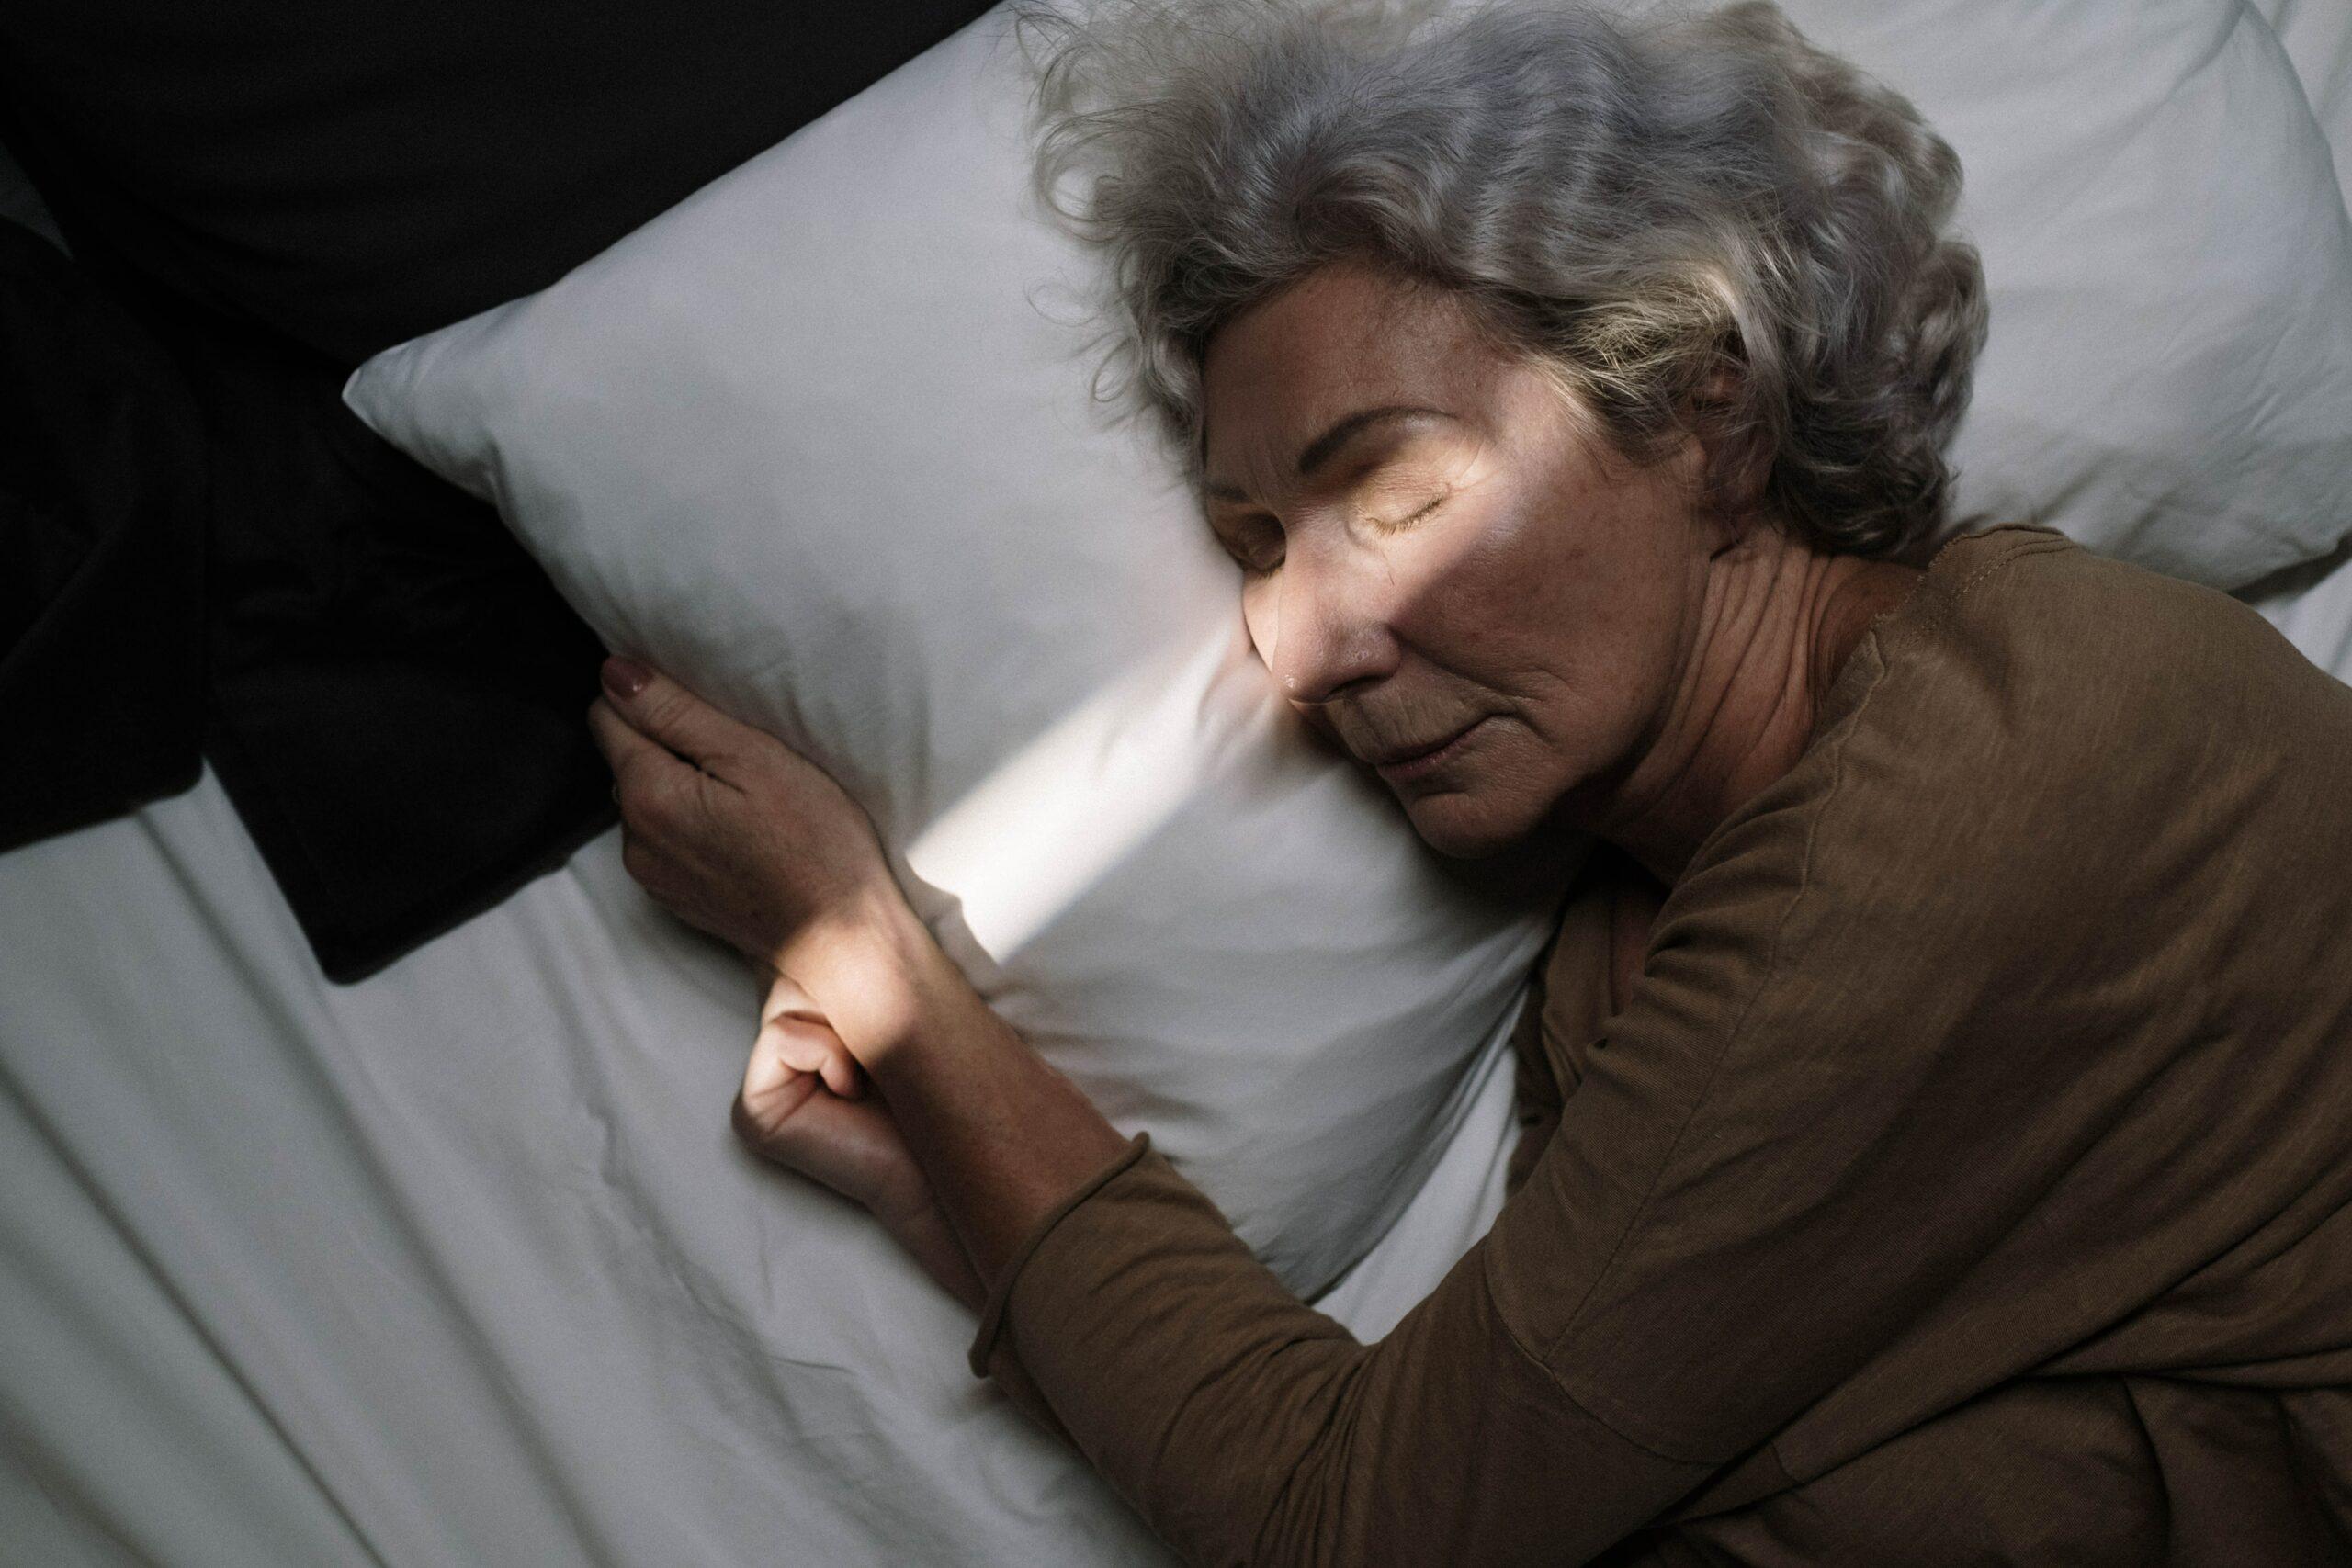 I Can't Sleep: What Should I Do?